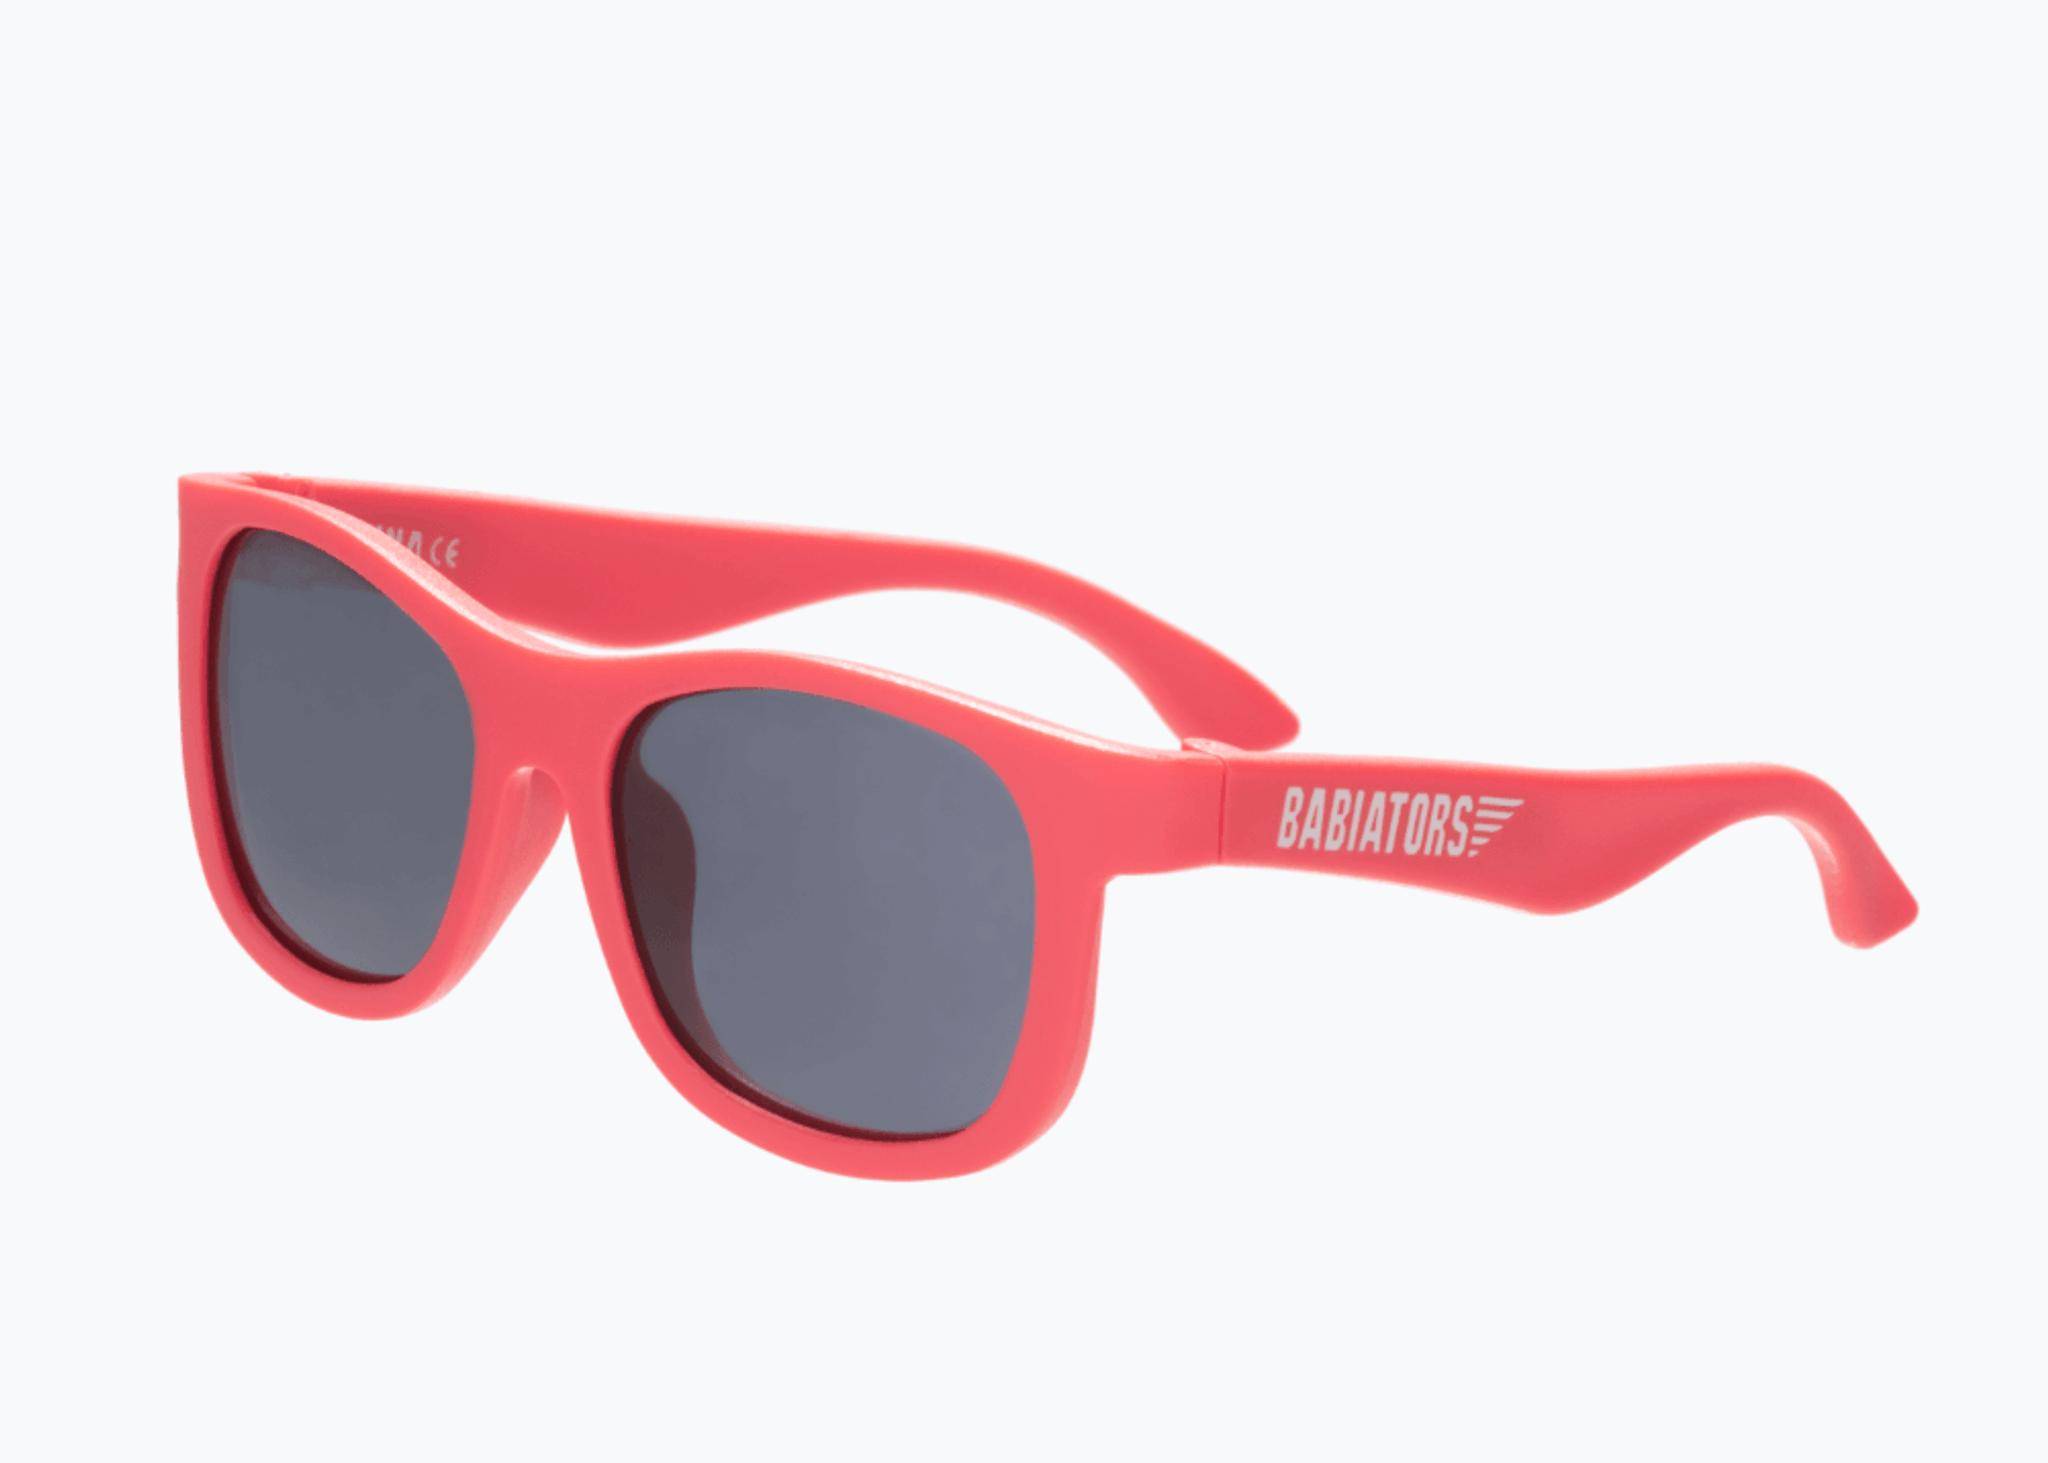 Babiators Sunglasses - Red